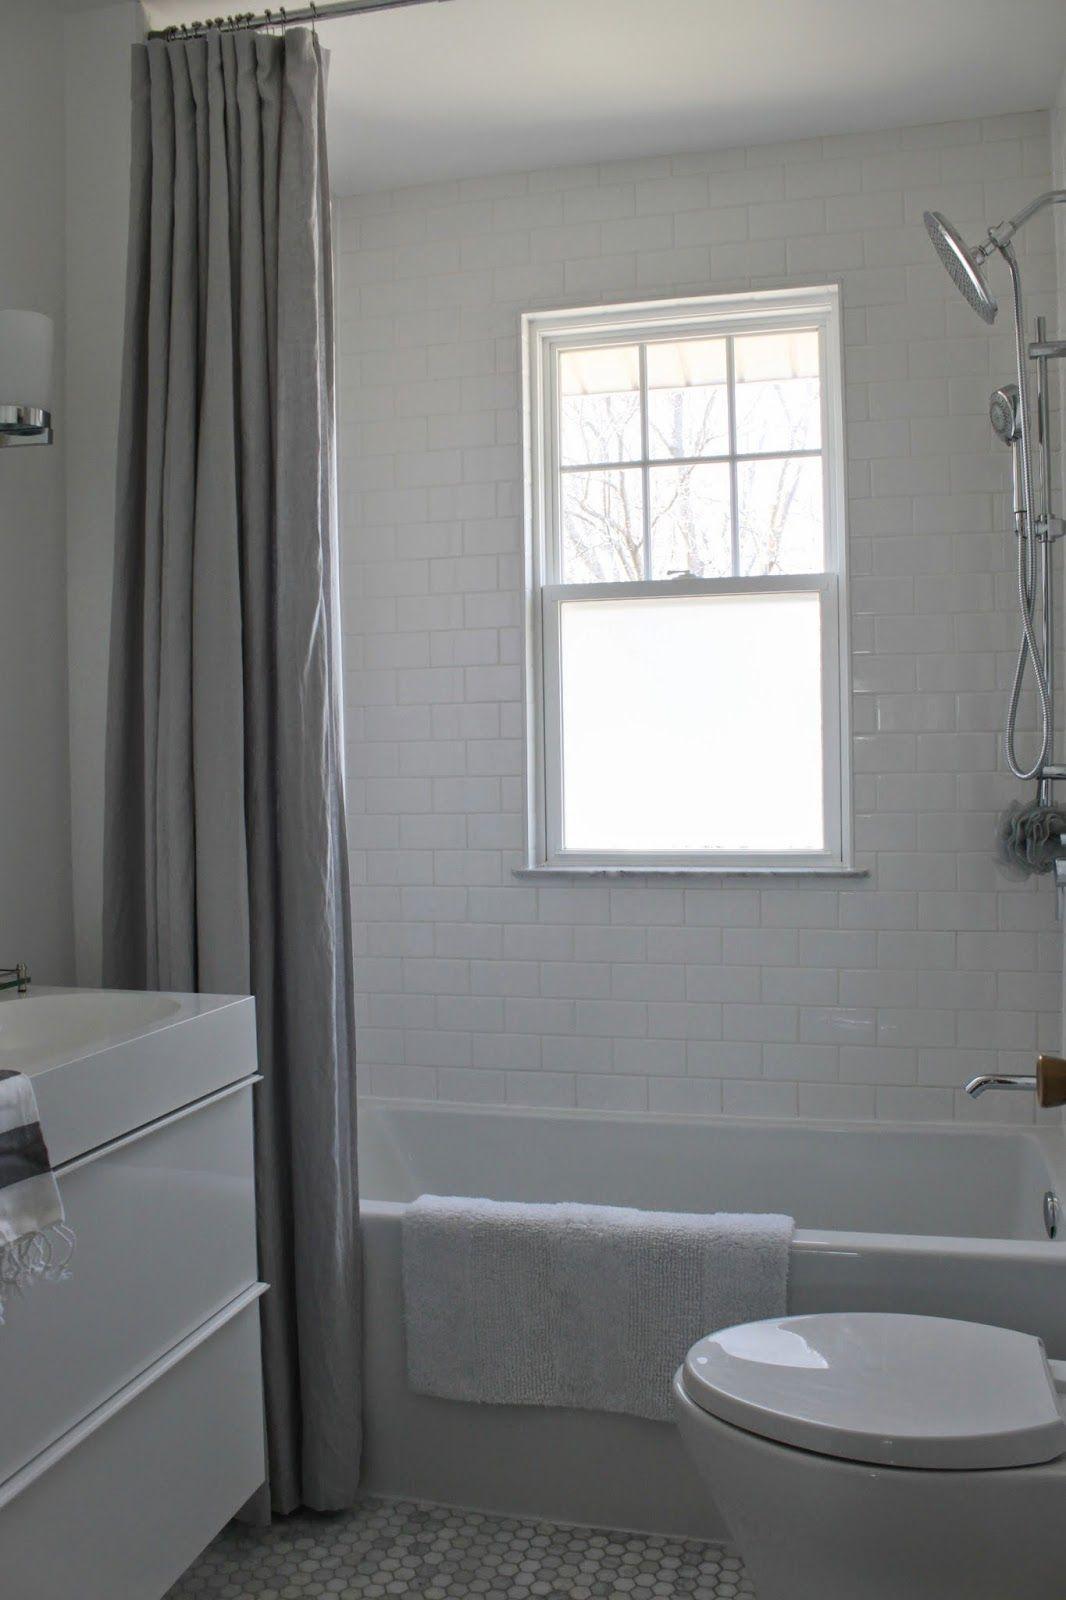 Making Rental Property Bathrooms Look Upscale On A Budget - Rental bathroom remodel